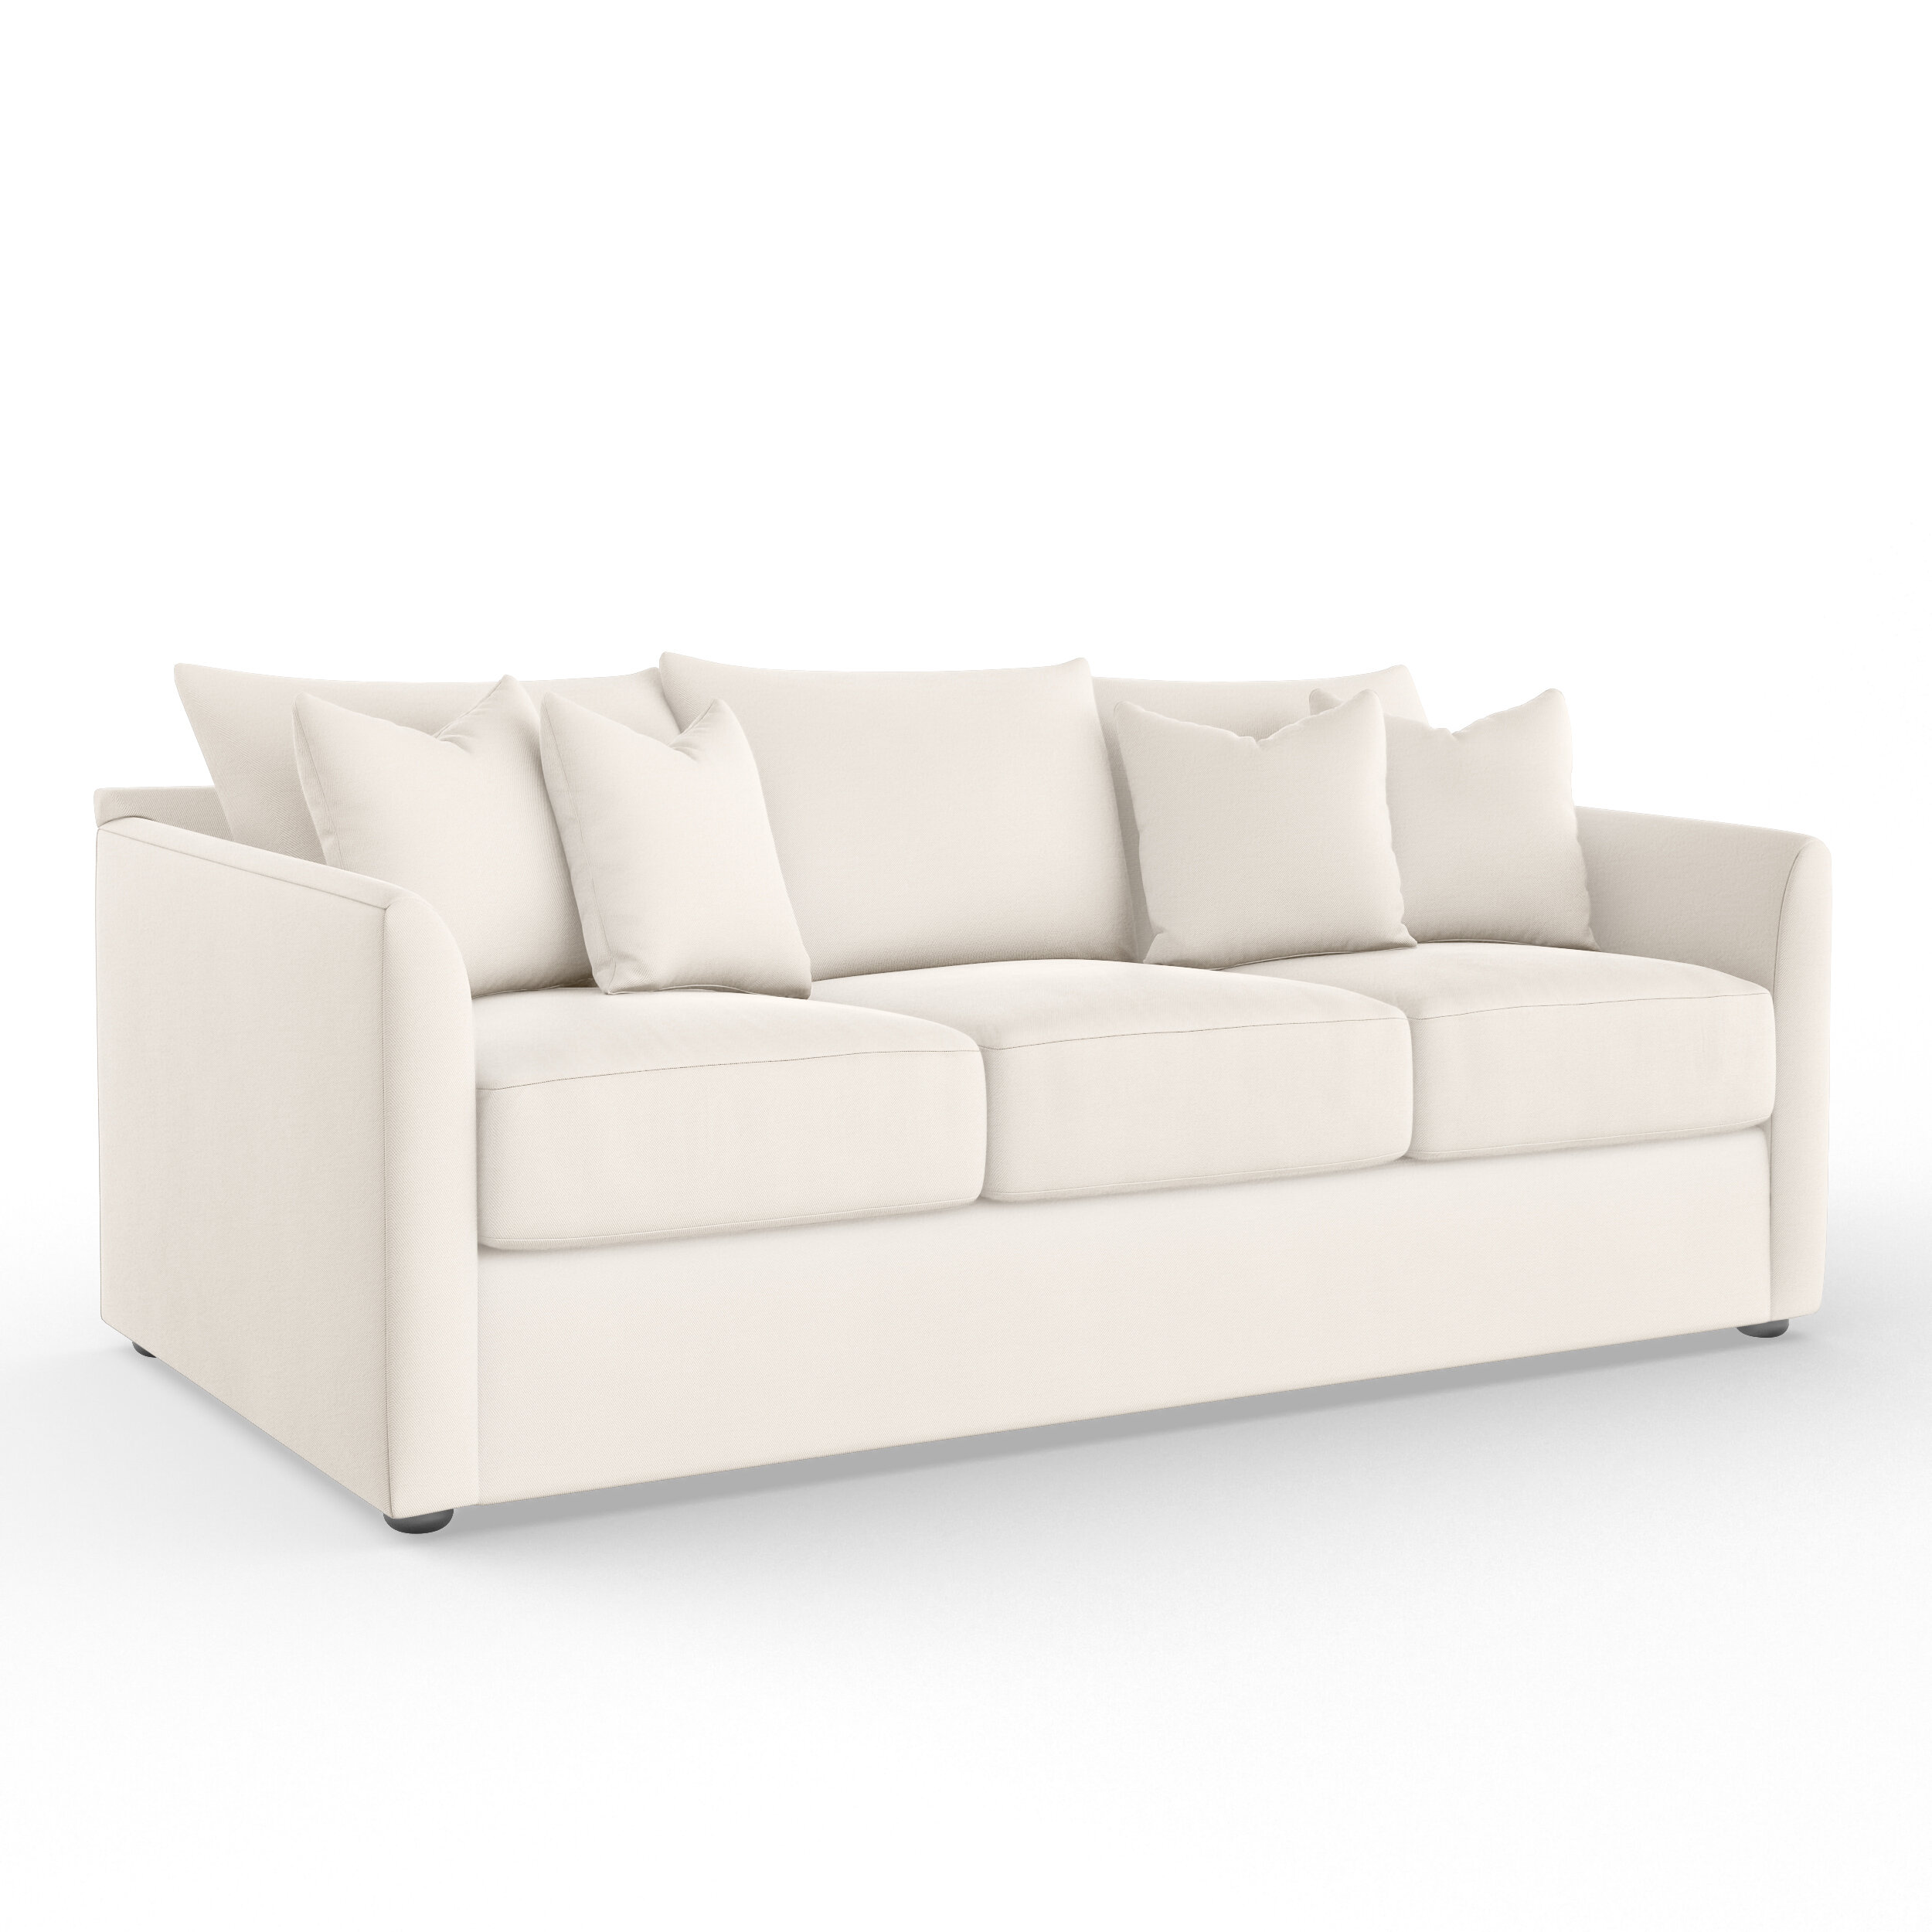 Wayfair Custom Upholstery™ Peyton Sofa U0026 Reviews | Wayfair